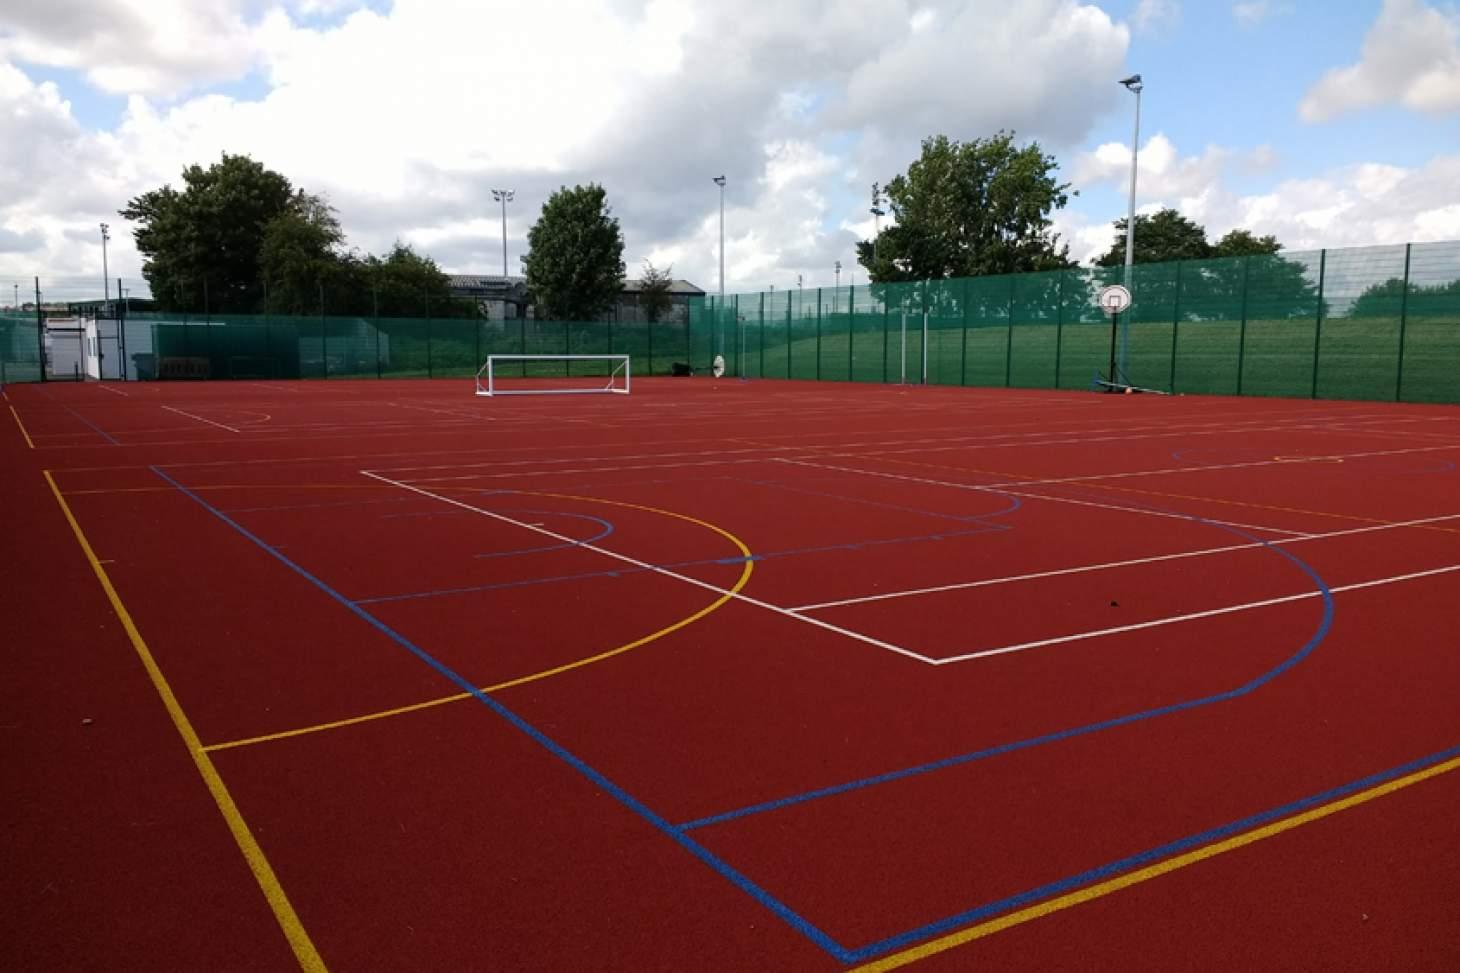 Oasis Academy Arena Outdoor | Hard (macadam) netball court